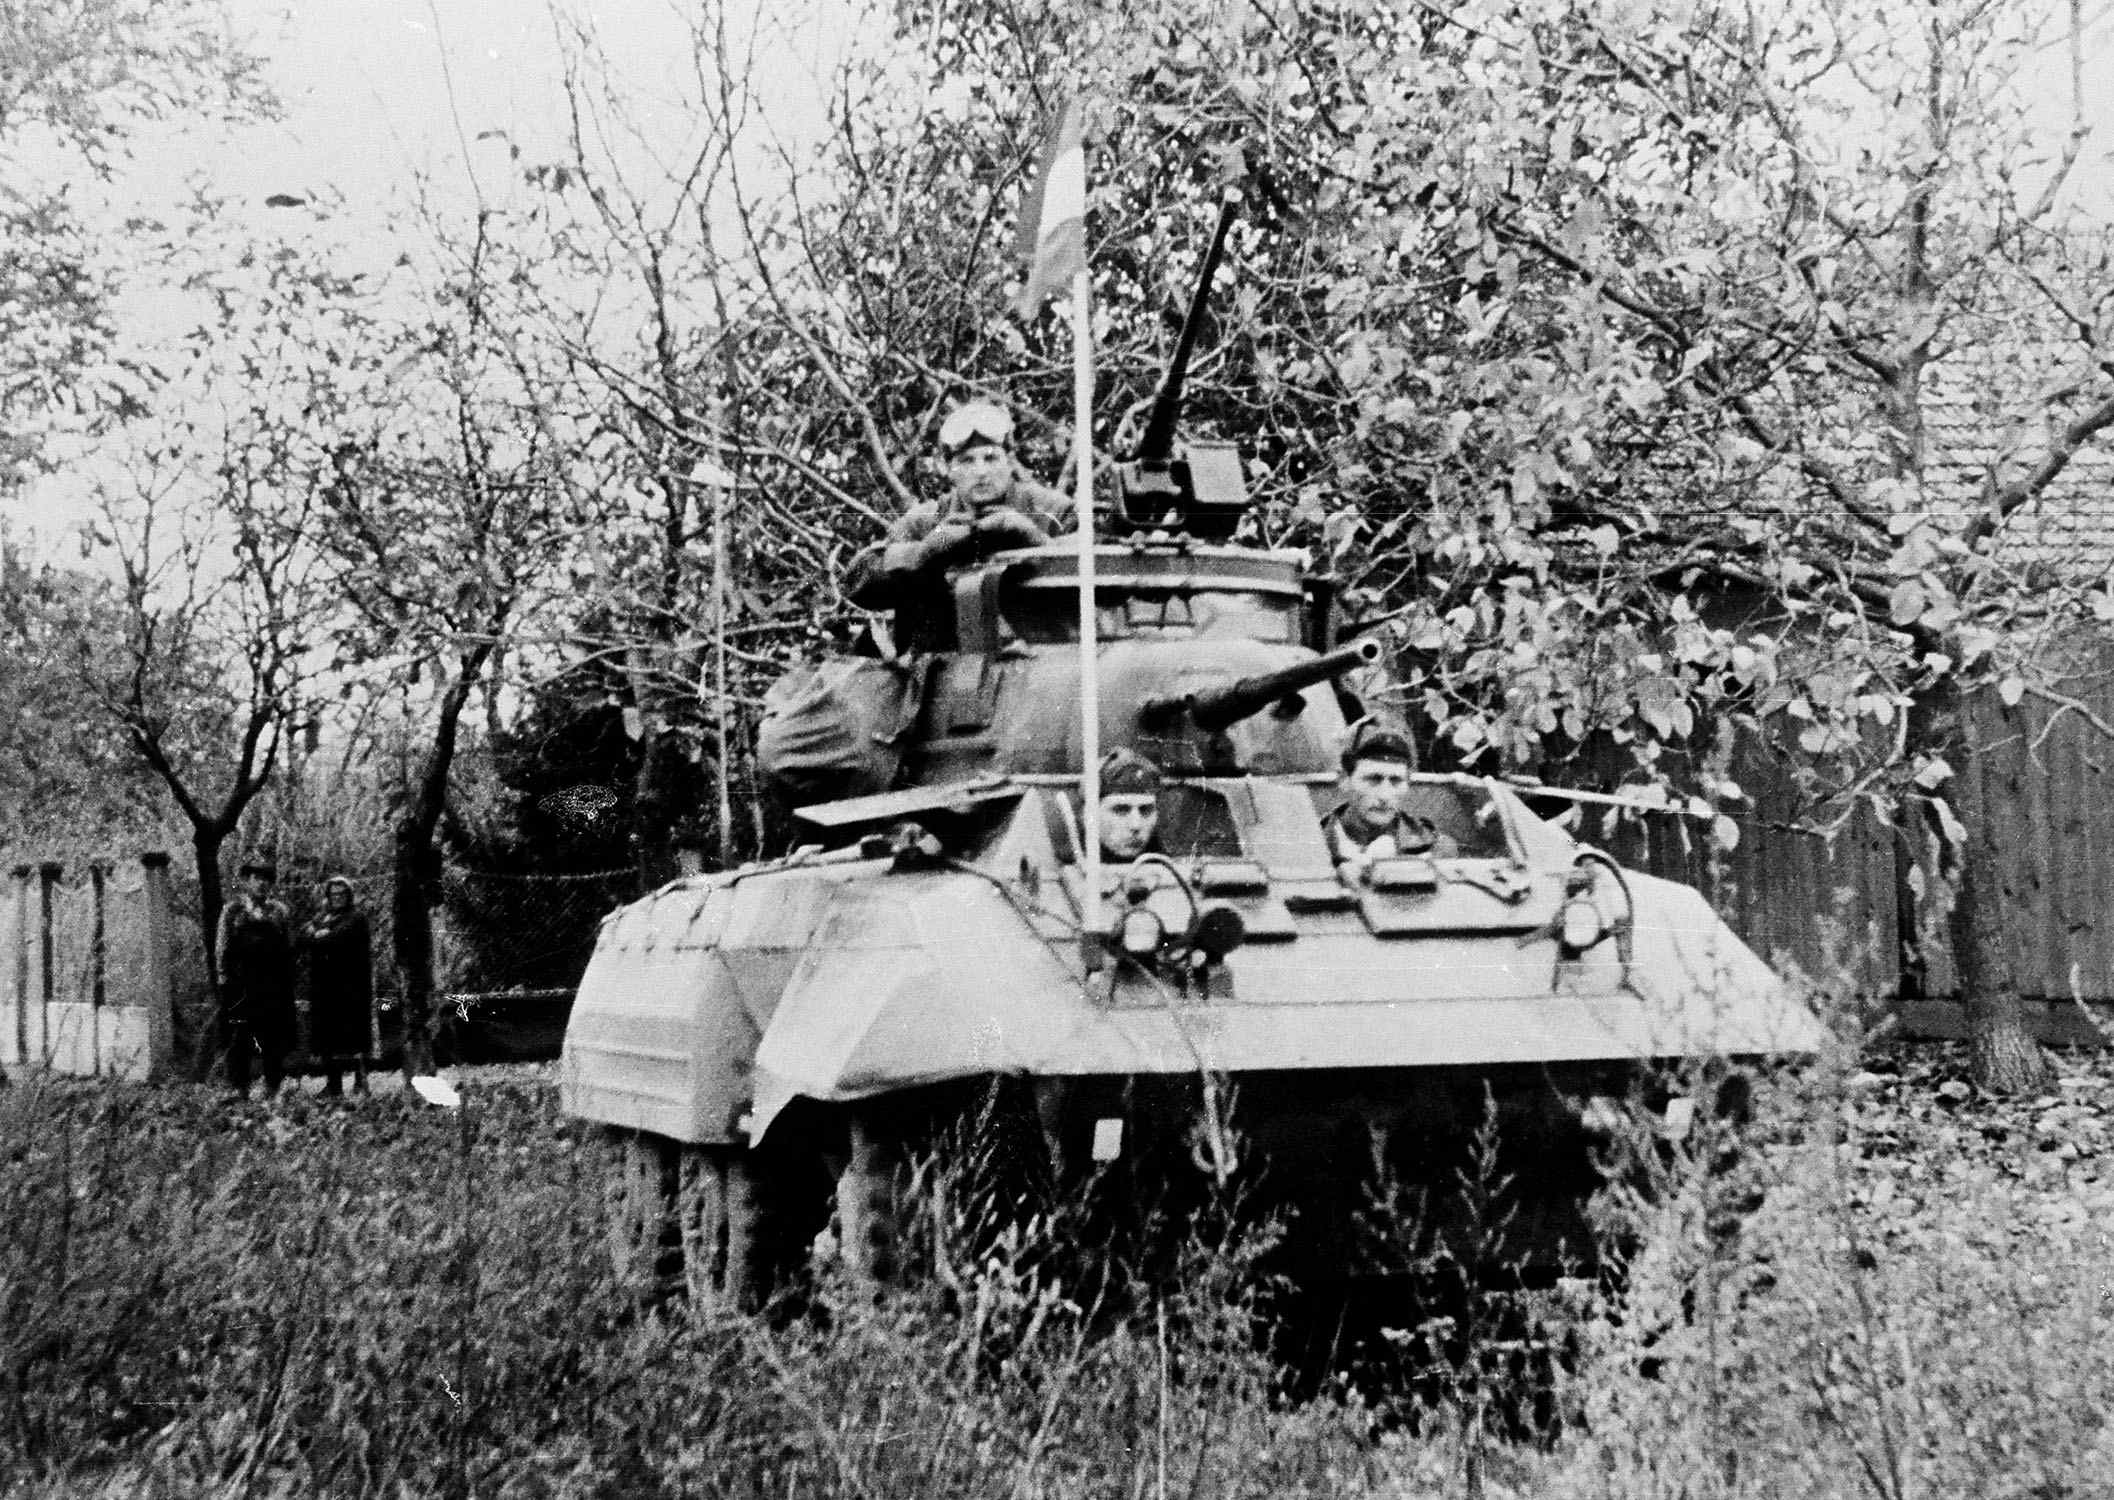 D:\Archiv Nemeth\Fzg-Gerät-Ausrüstung\Fahrzeuge\Mehrspurige Kfz\BH Fahrzeuge\M8\Ungarn 1956\mit Fahne.jpg